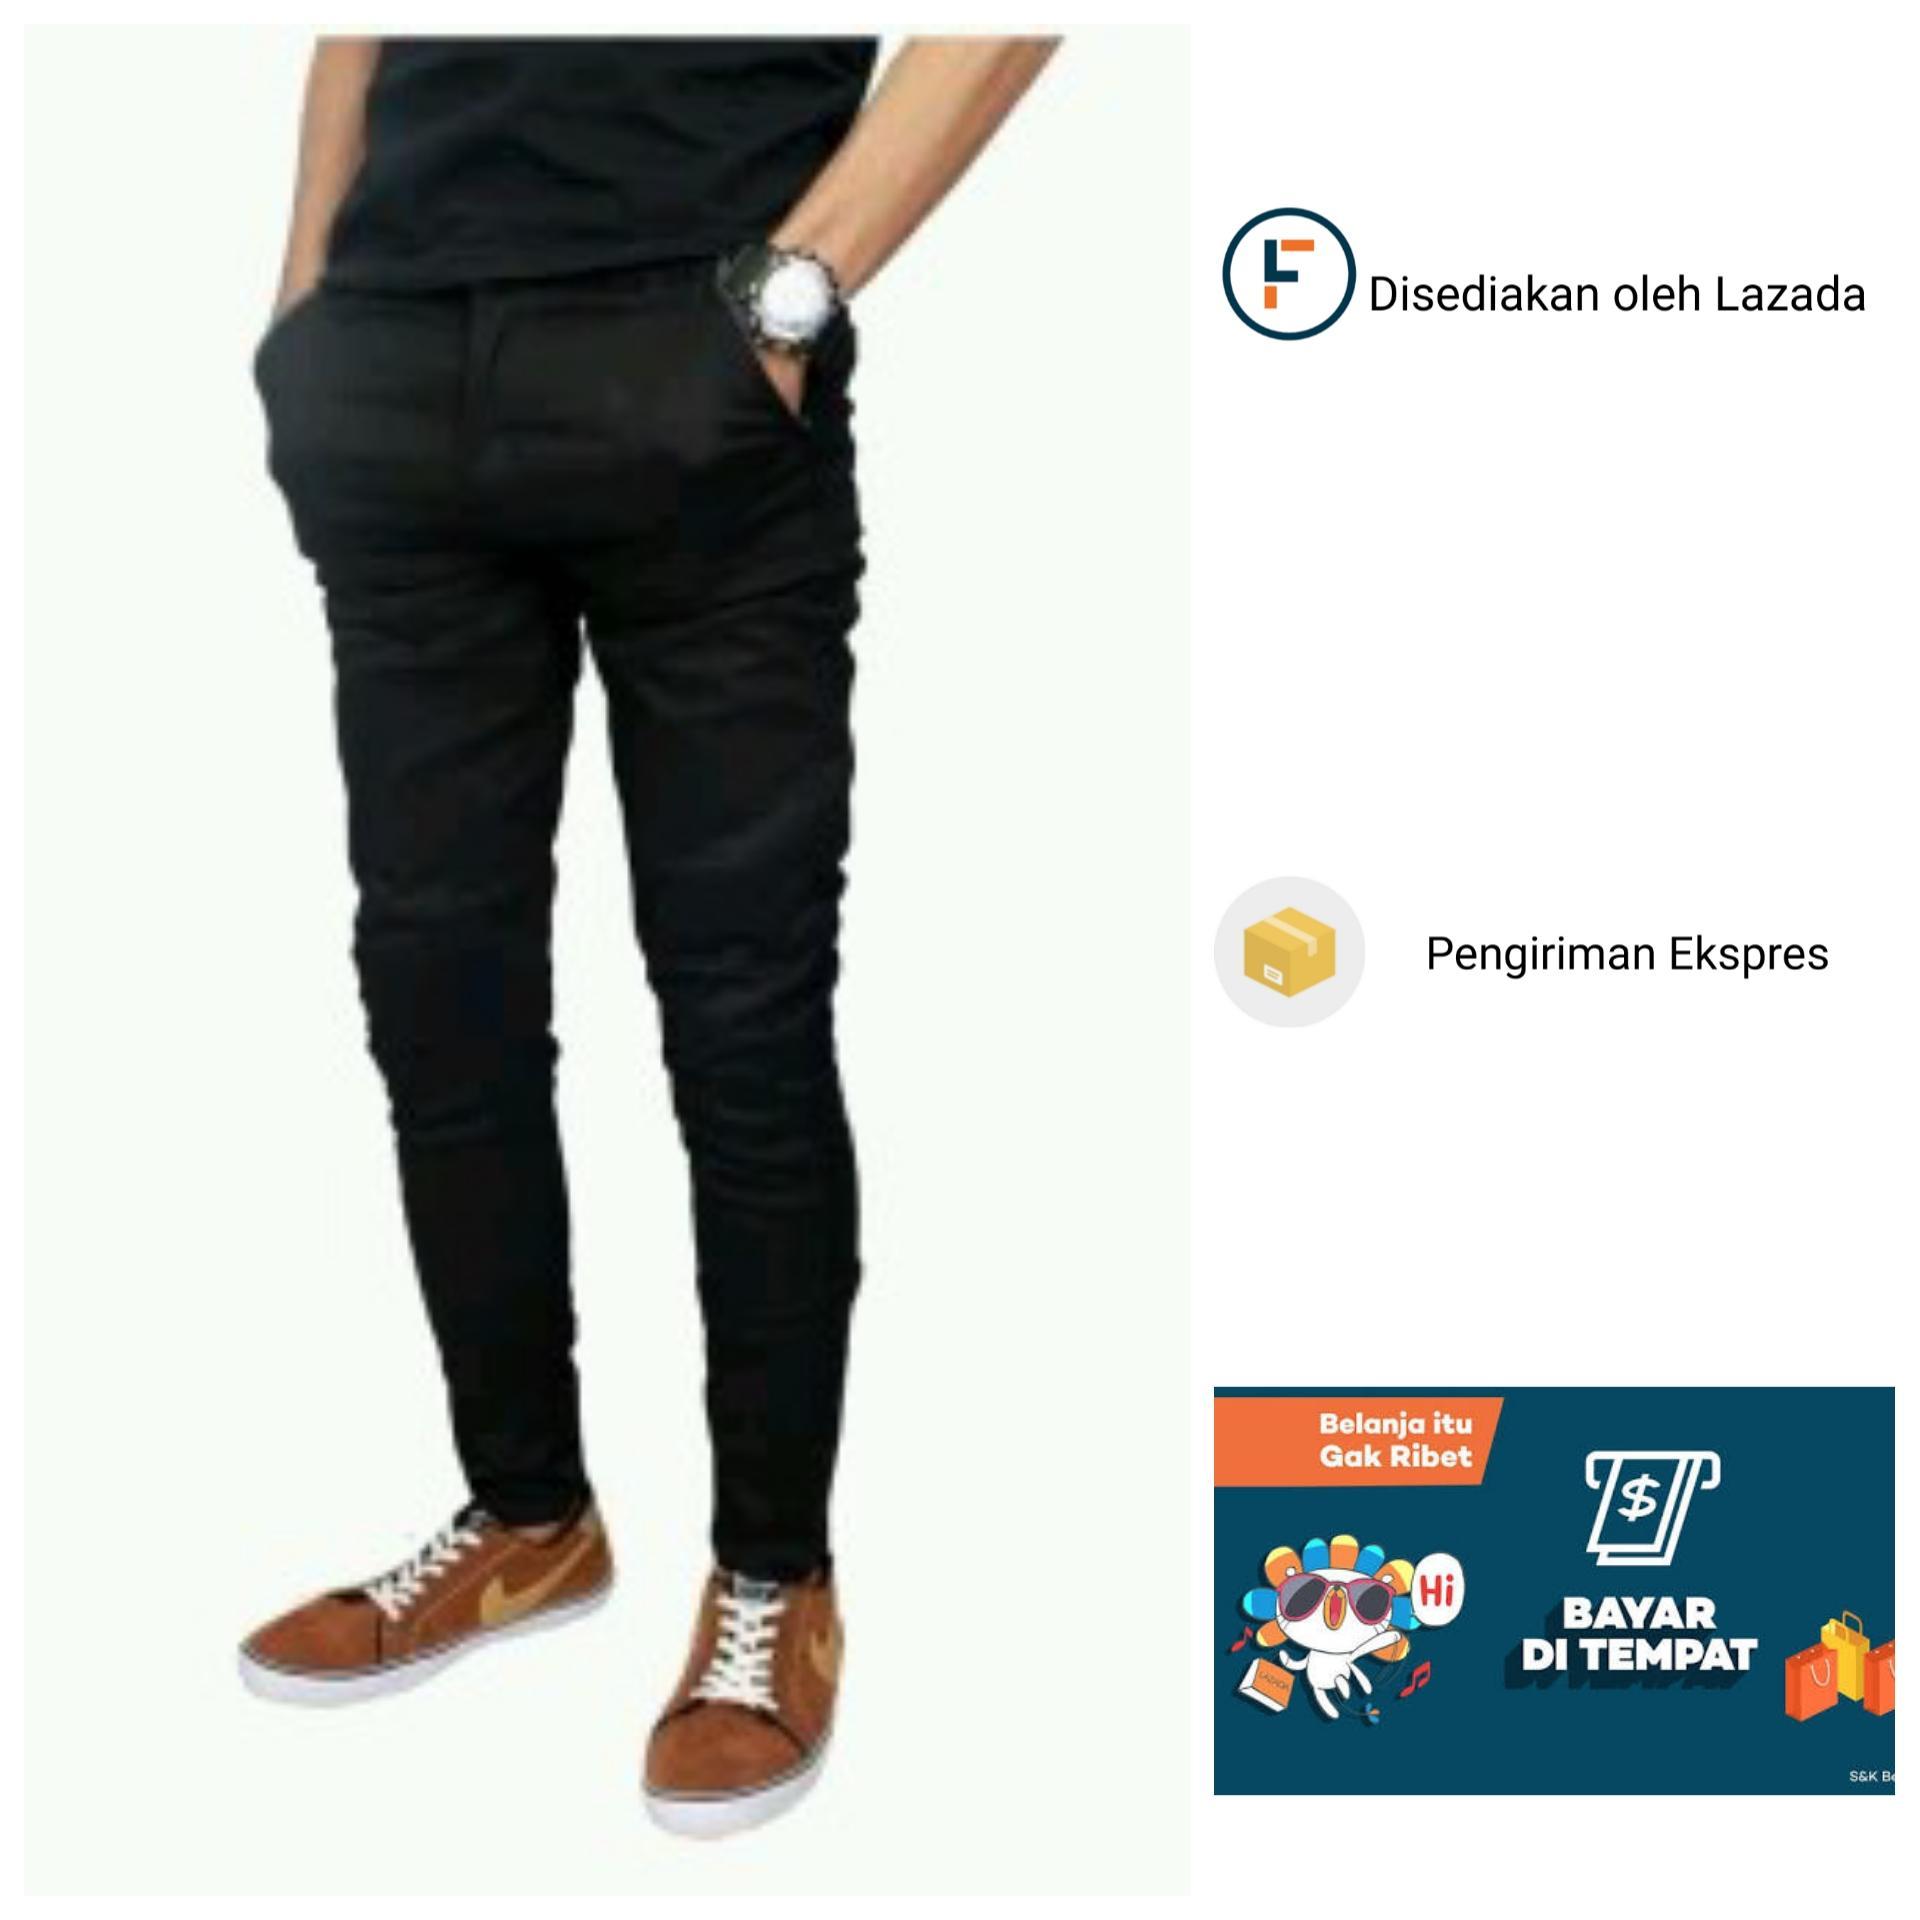 Pakaian Pria Lgs Slim Fit Kemeja Fashion Biru Muda Denim Polos S